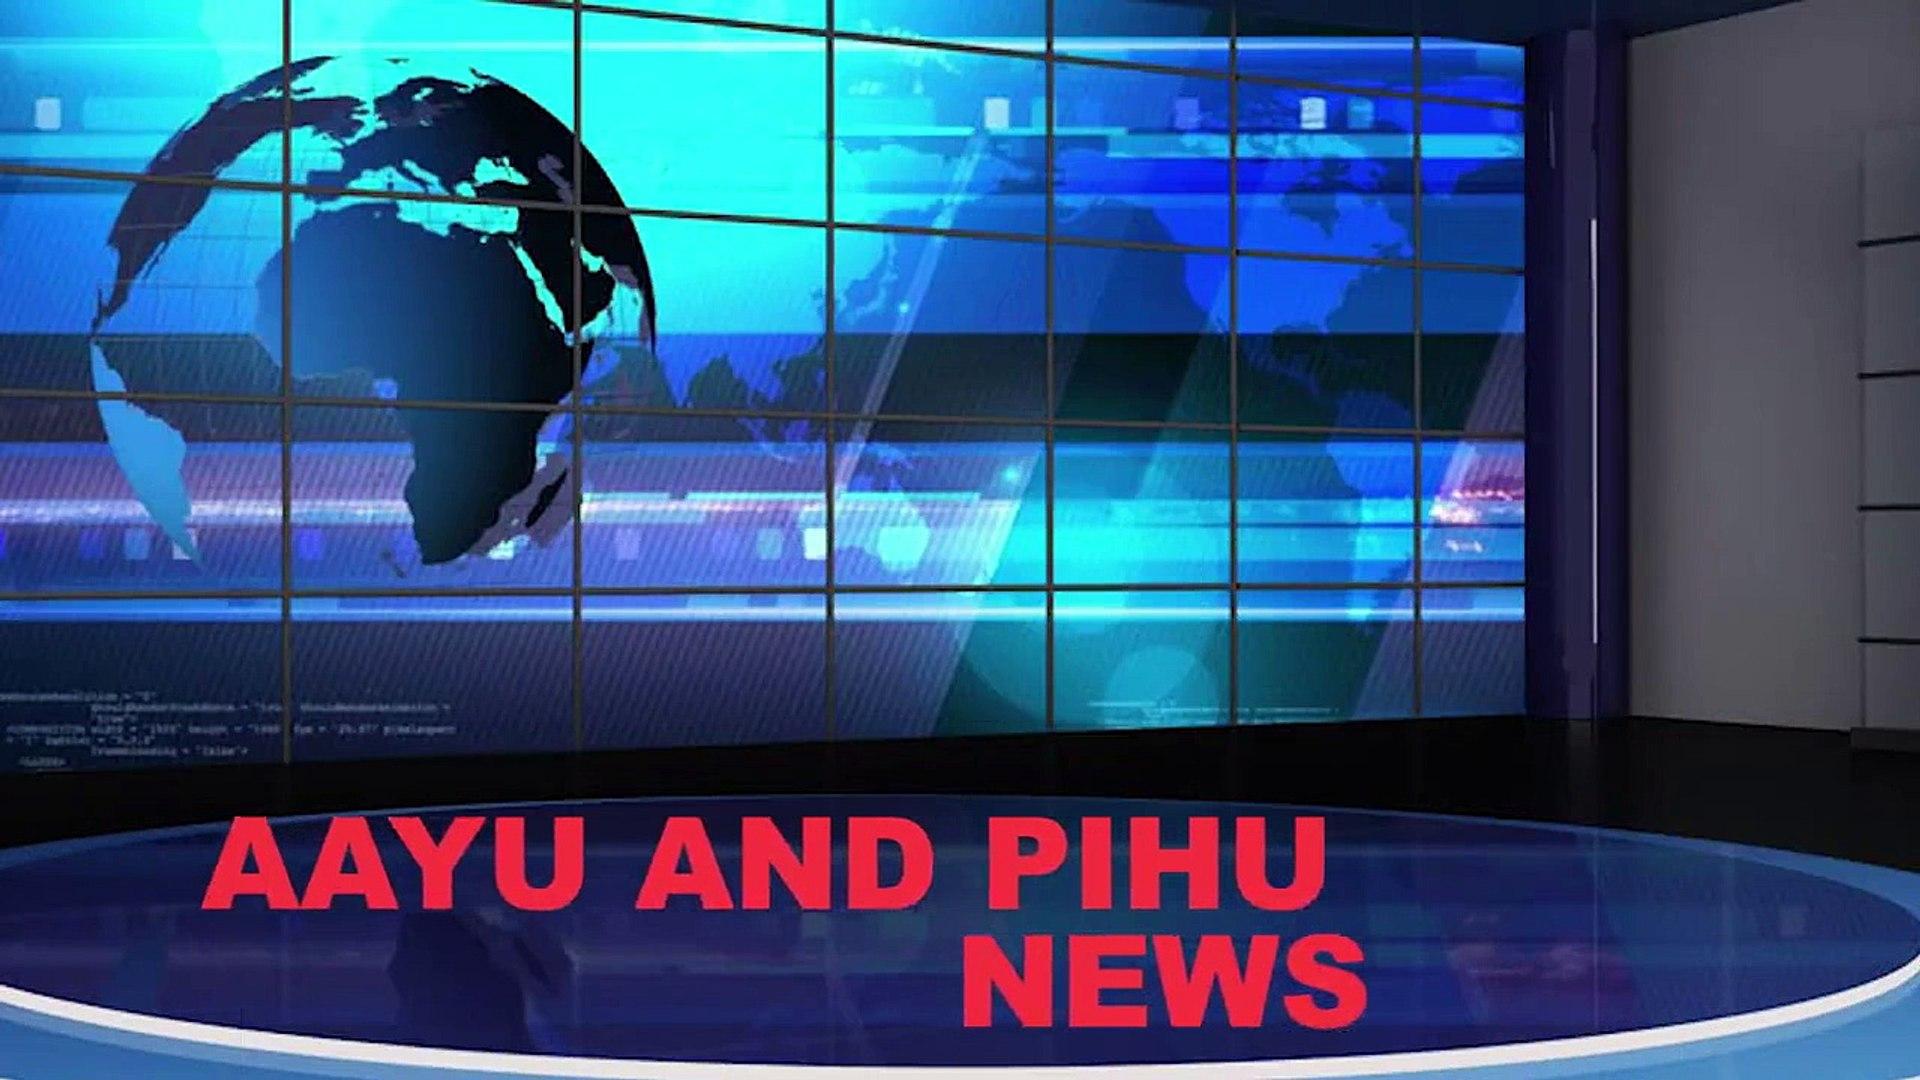 KIDS COMEDY SHOW | MUMMY ANGRY KIDS WATCHING CARTOON | INDIAN FAMILY VIDEOS | AAYU AND PIHU SHOW